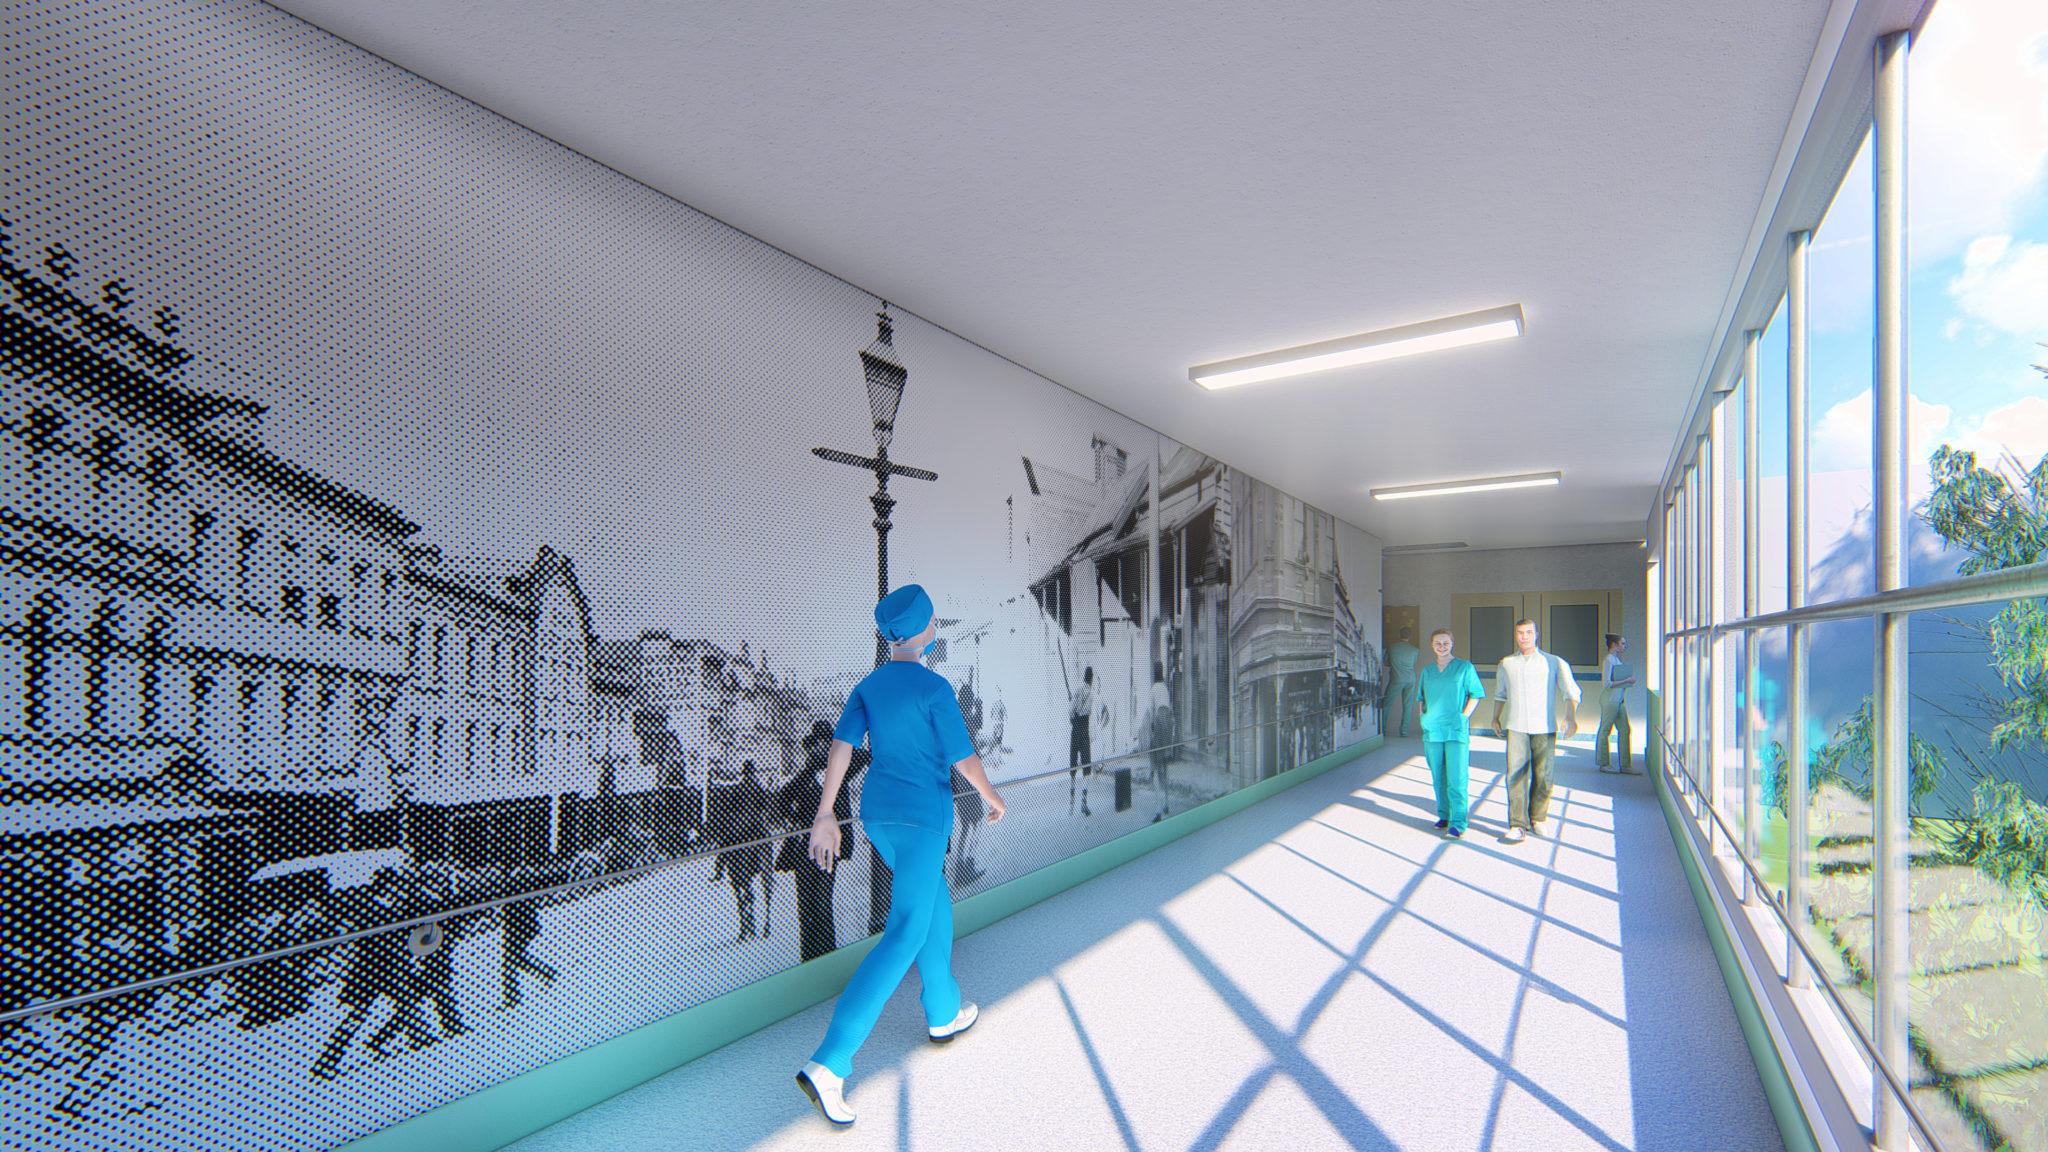 Interpretation corridor filled with natural light